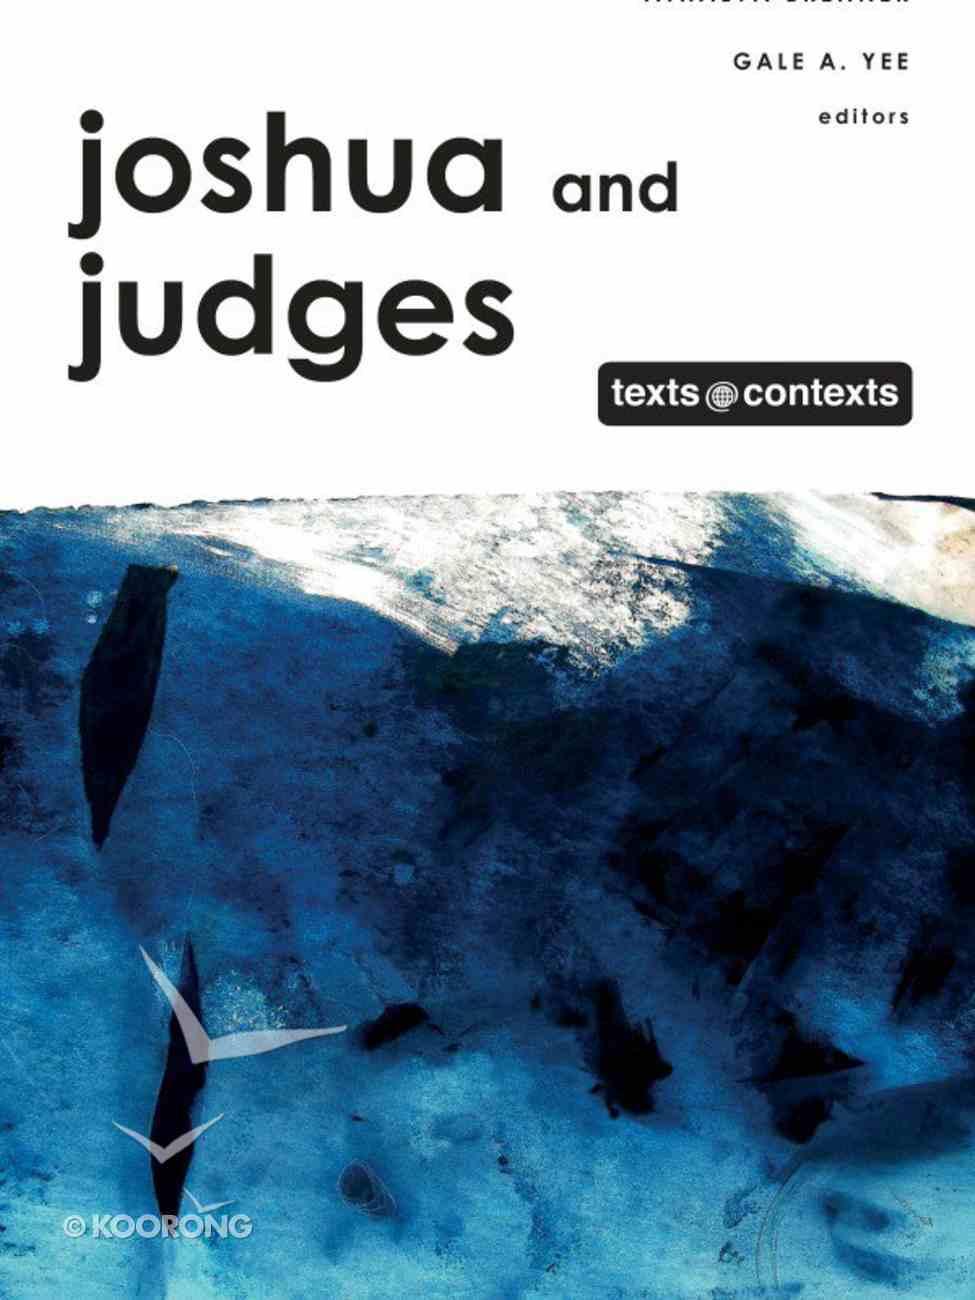 Joshua and Judges (Texts And Contexts Series) eBook